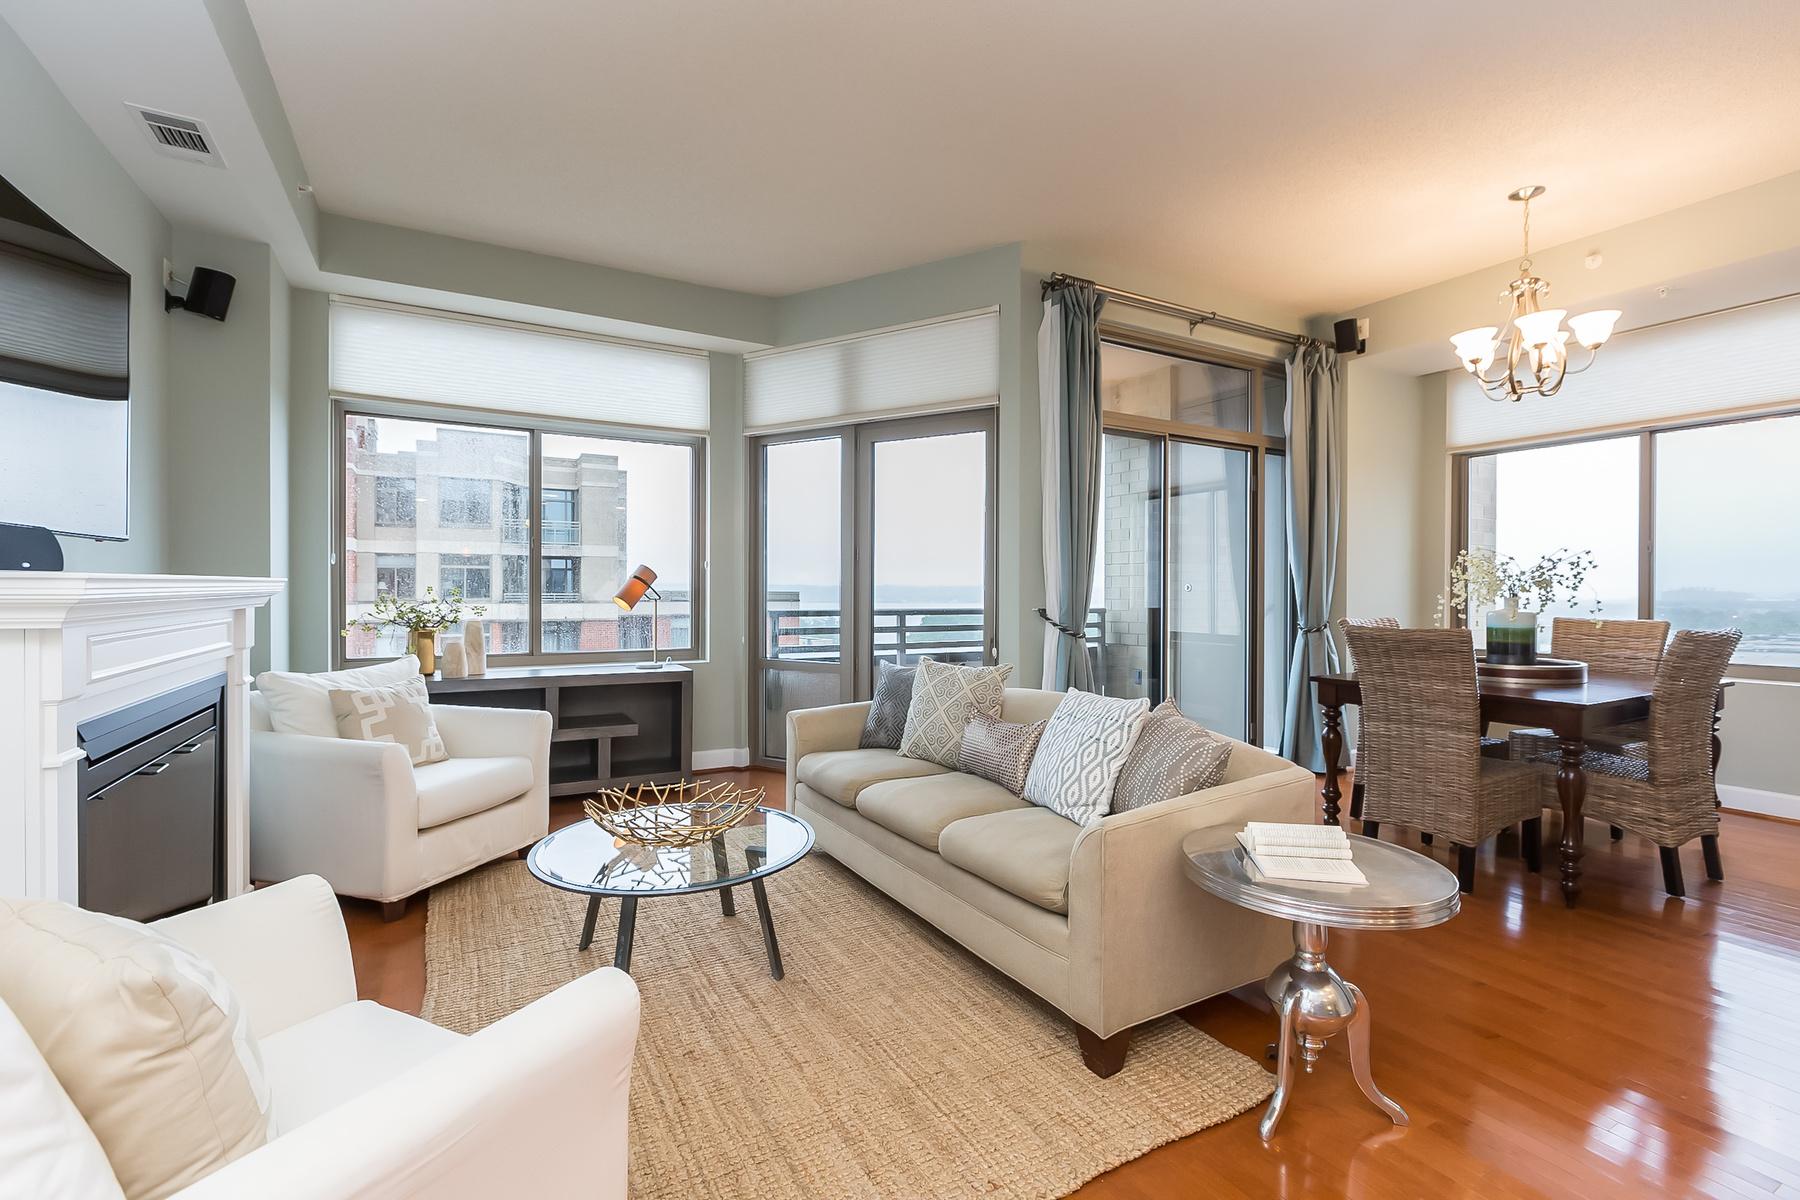 Condominium for Sale at 3600 Glebe Road S 1018W, Arlington Arlington, Virginia, 22202 United States